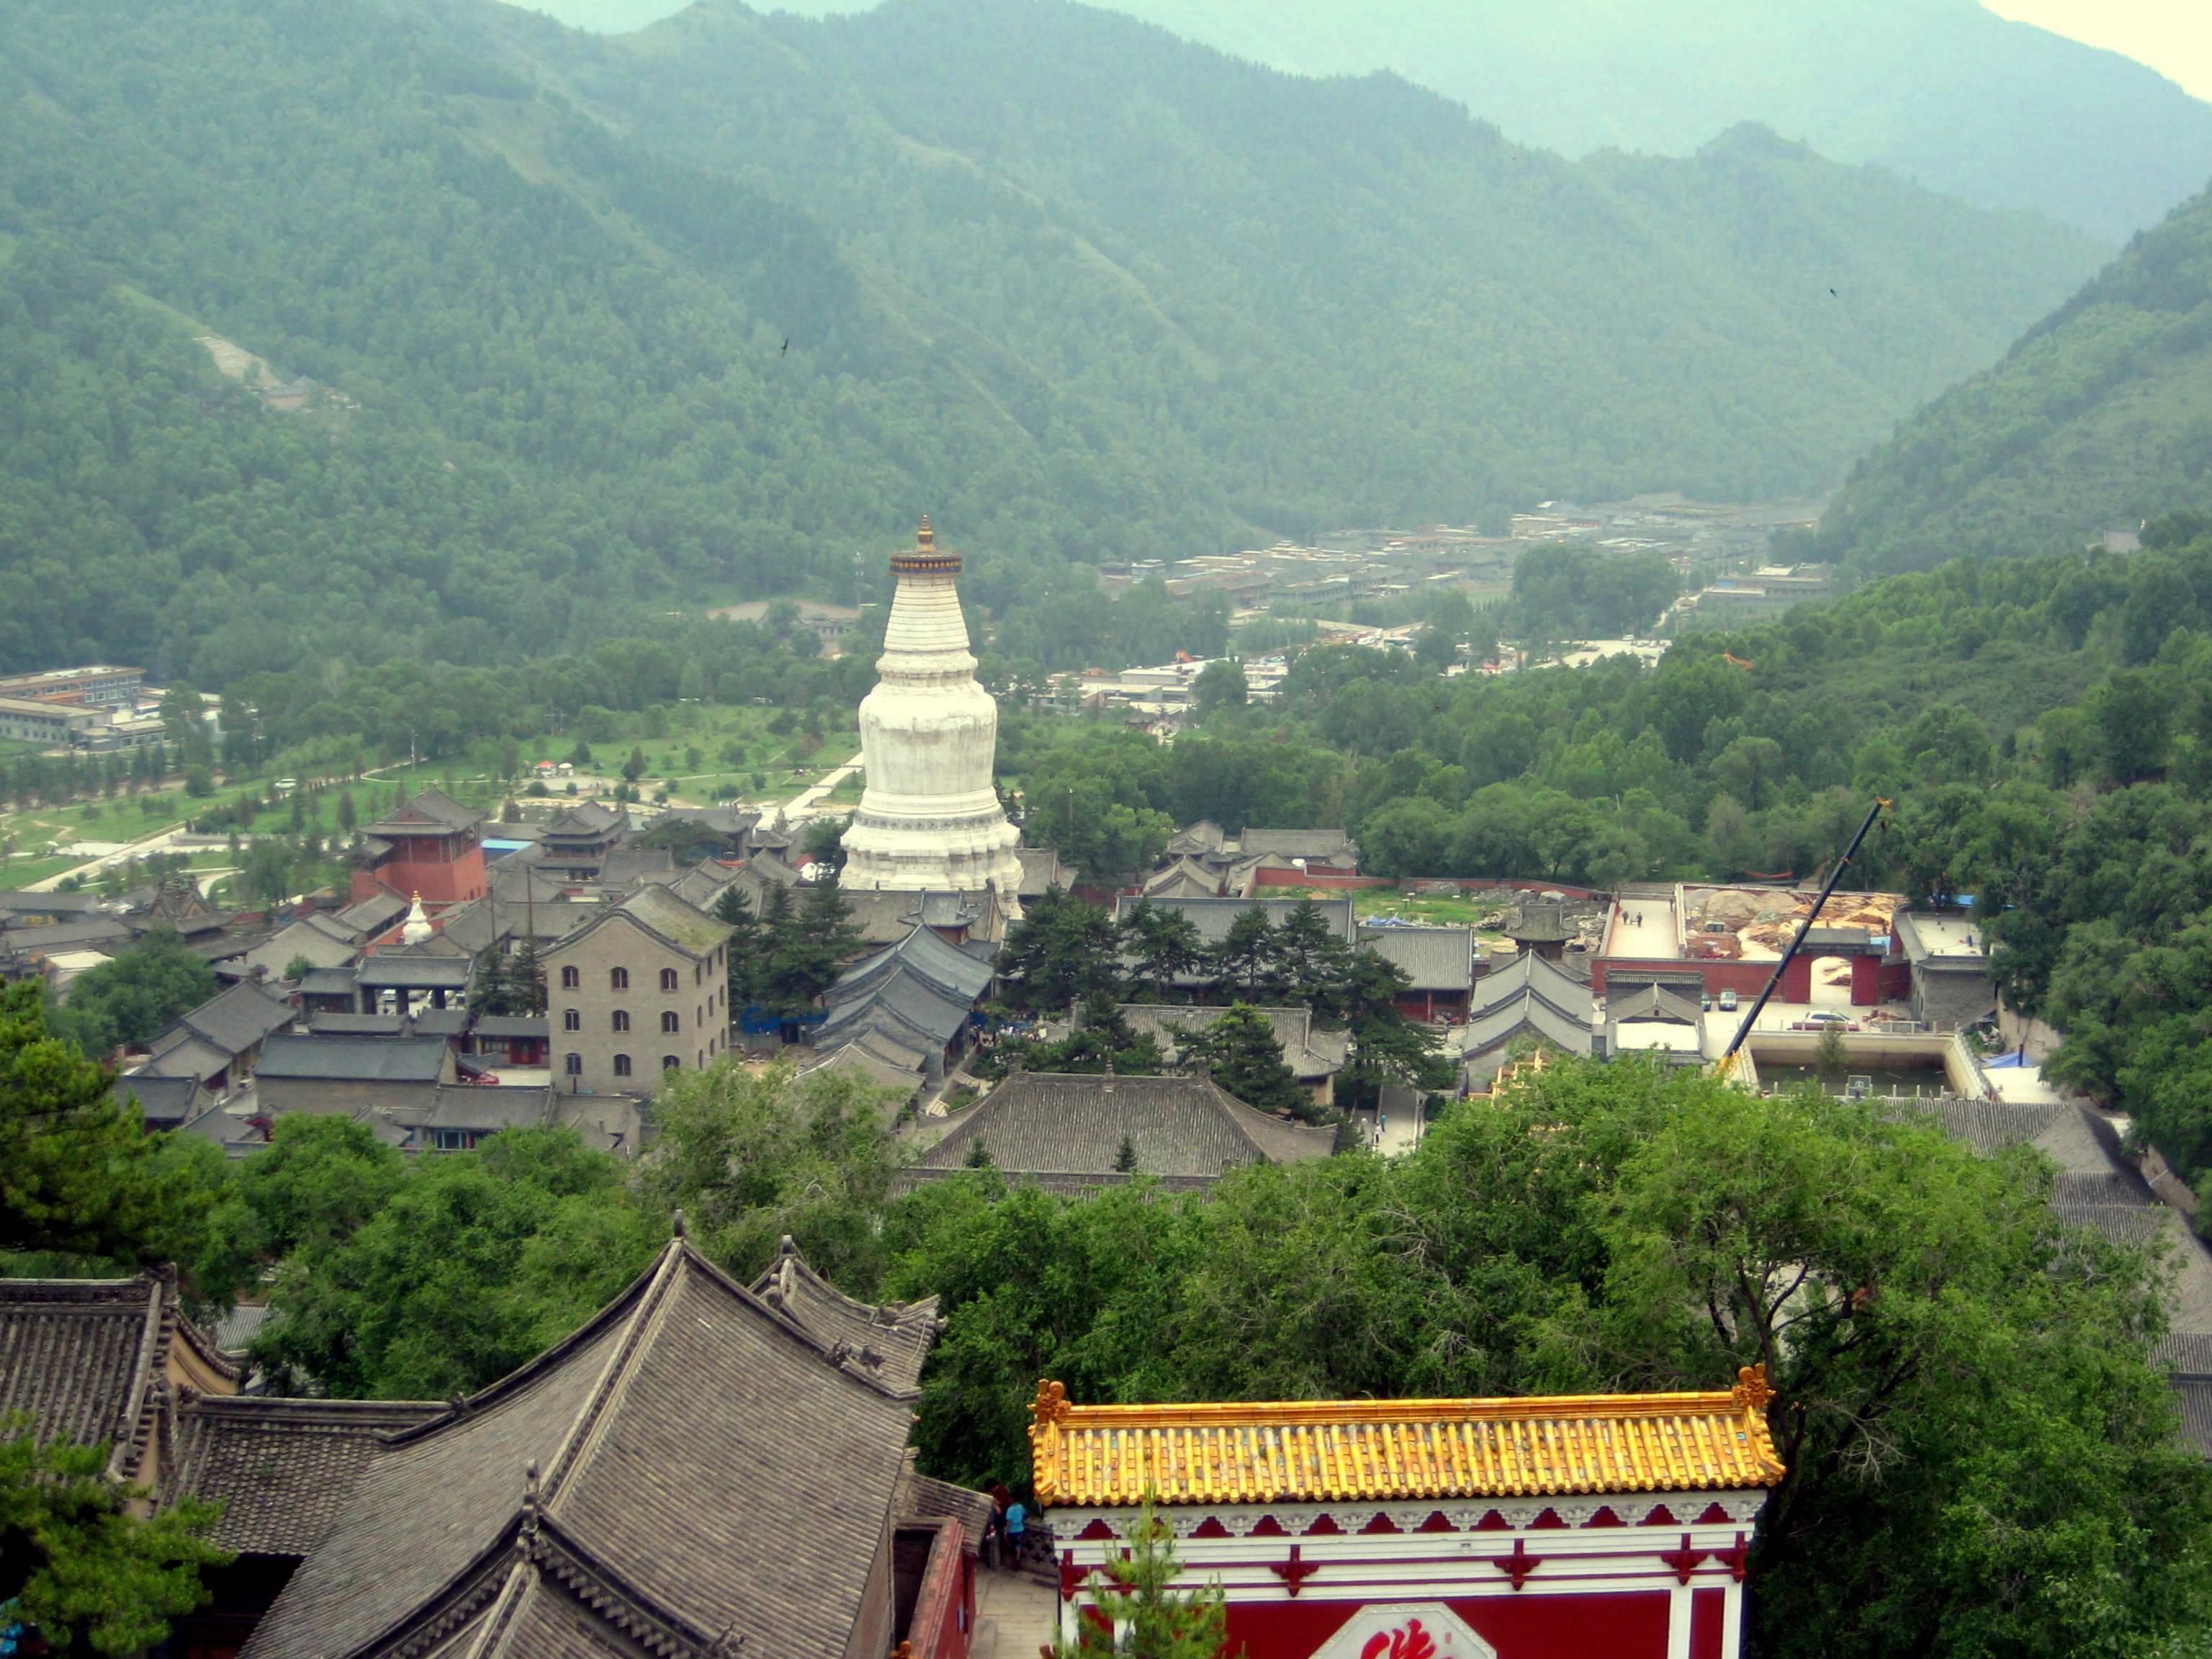 Wutaishan China  city photos gallery : Wutaishan « Coplans in China